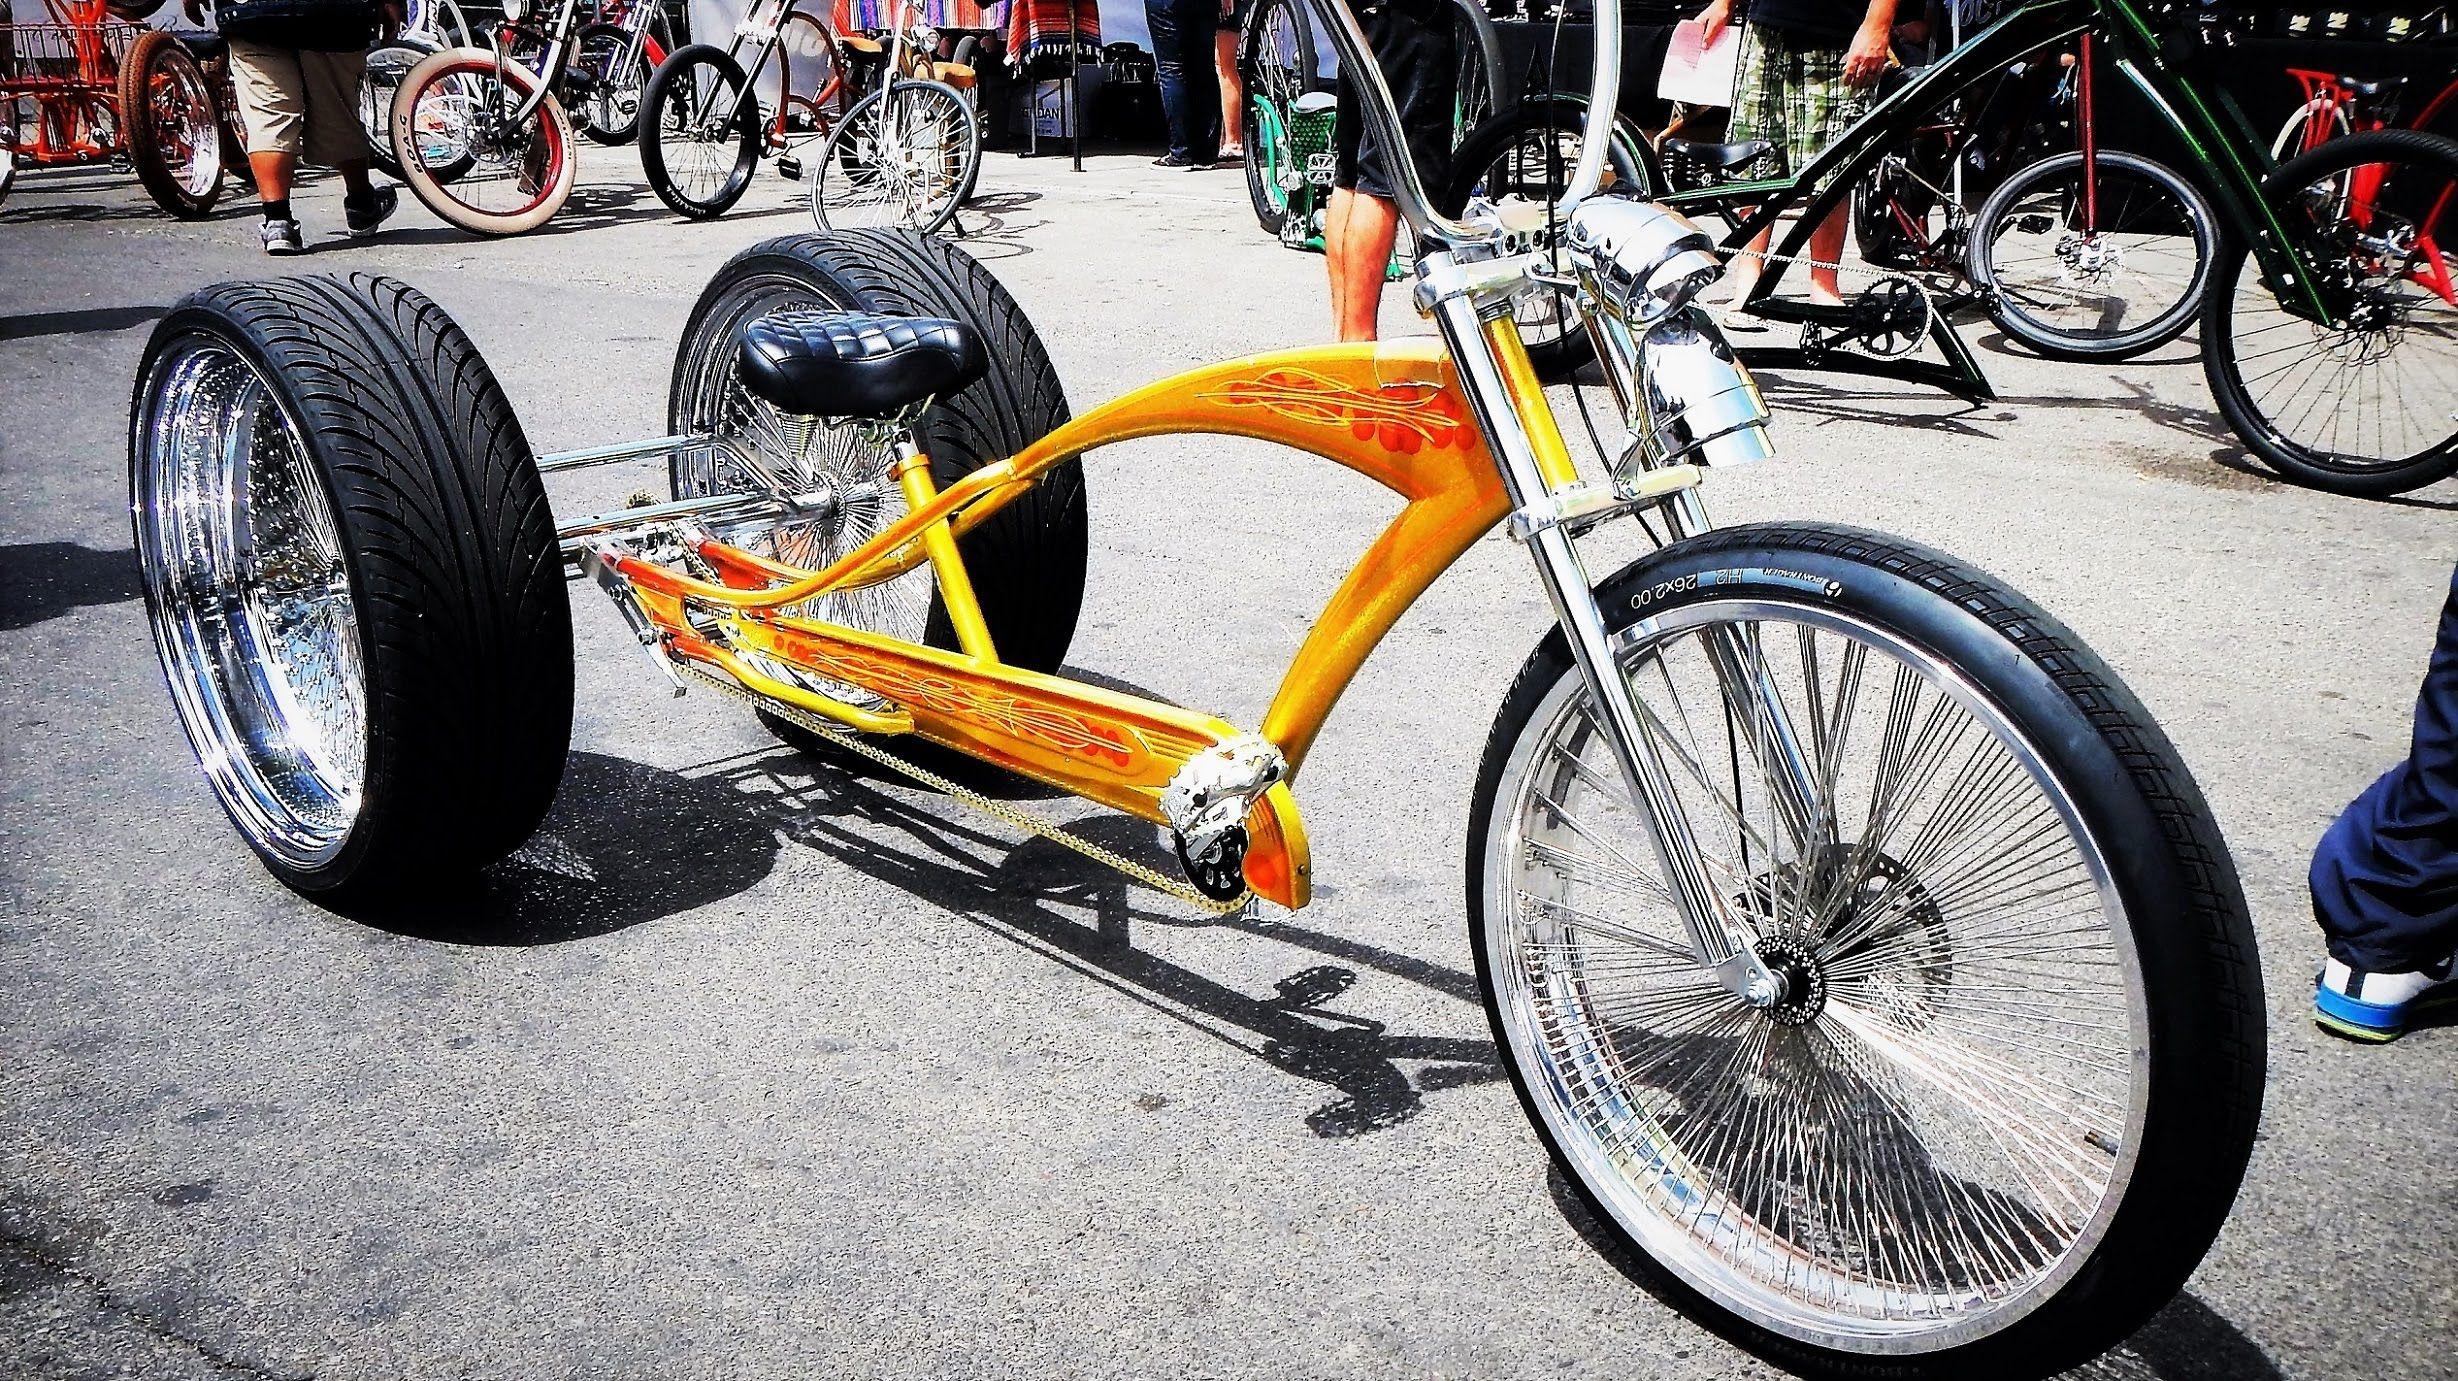 Ktc Obc Las Vegas 2016 International Custom Bike Event With